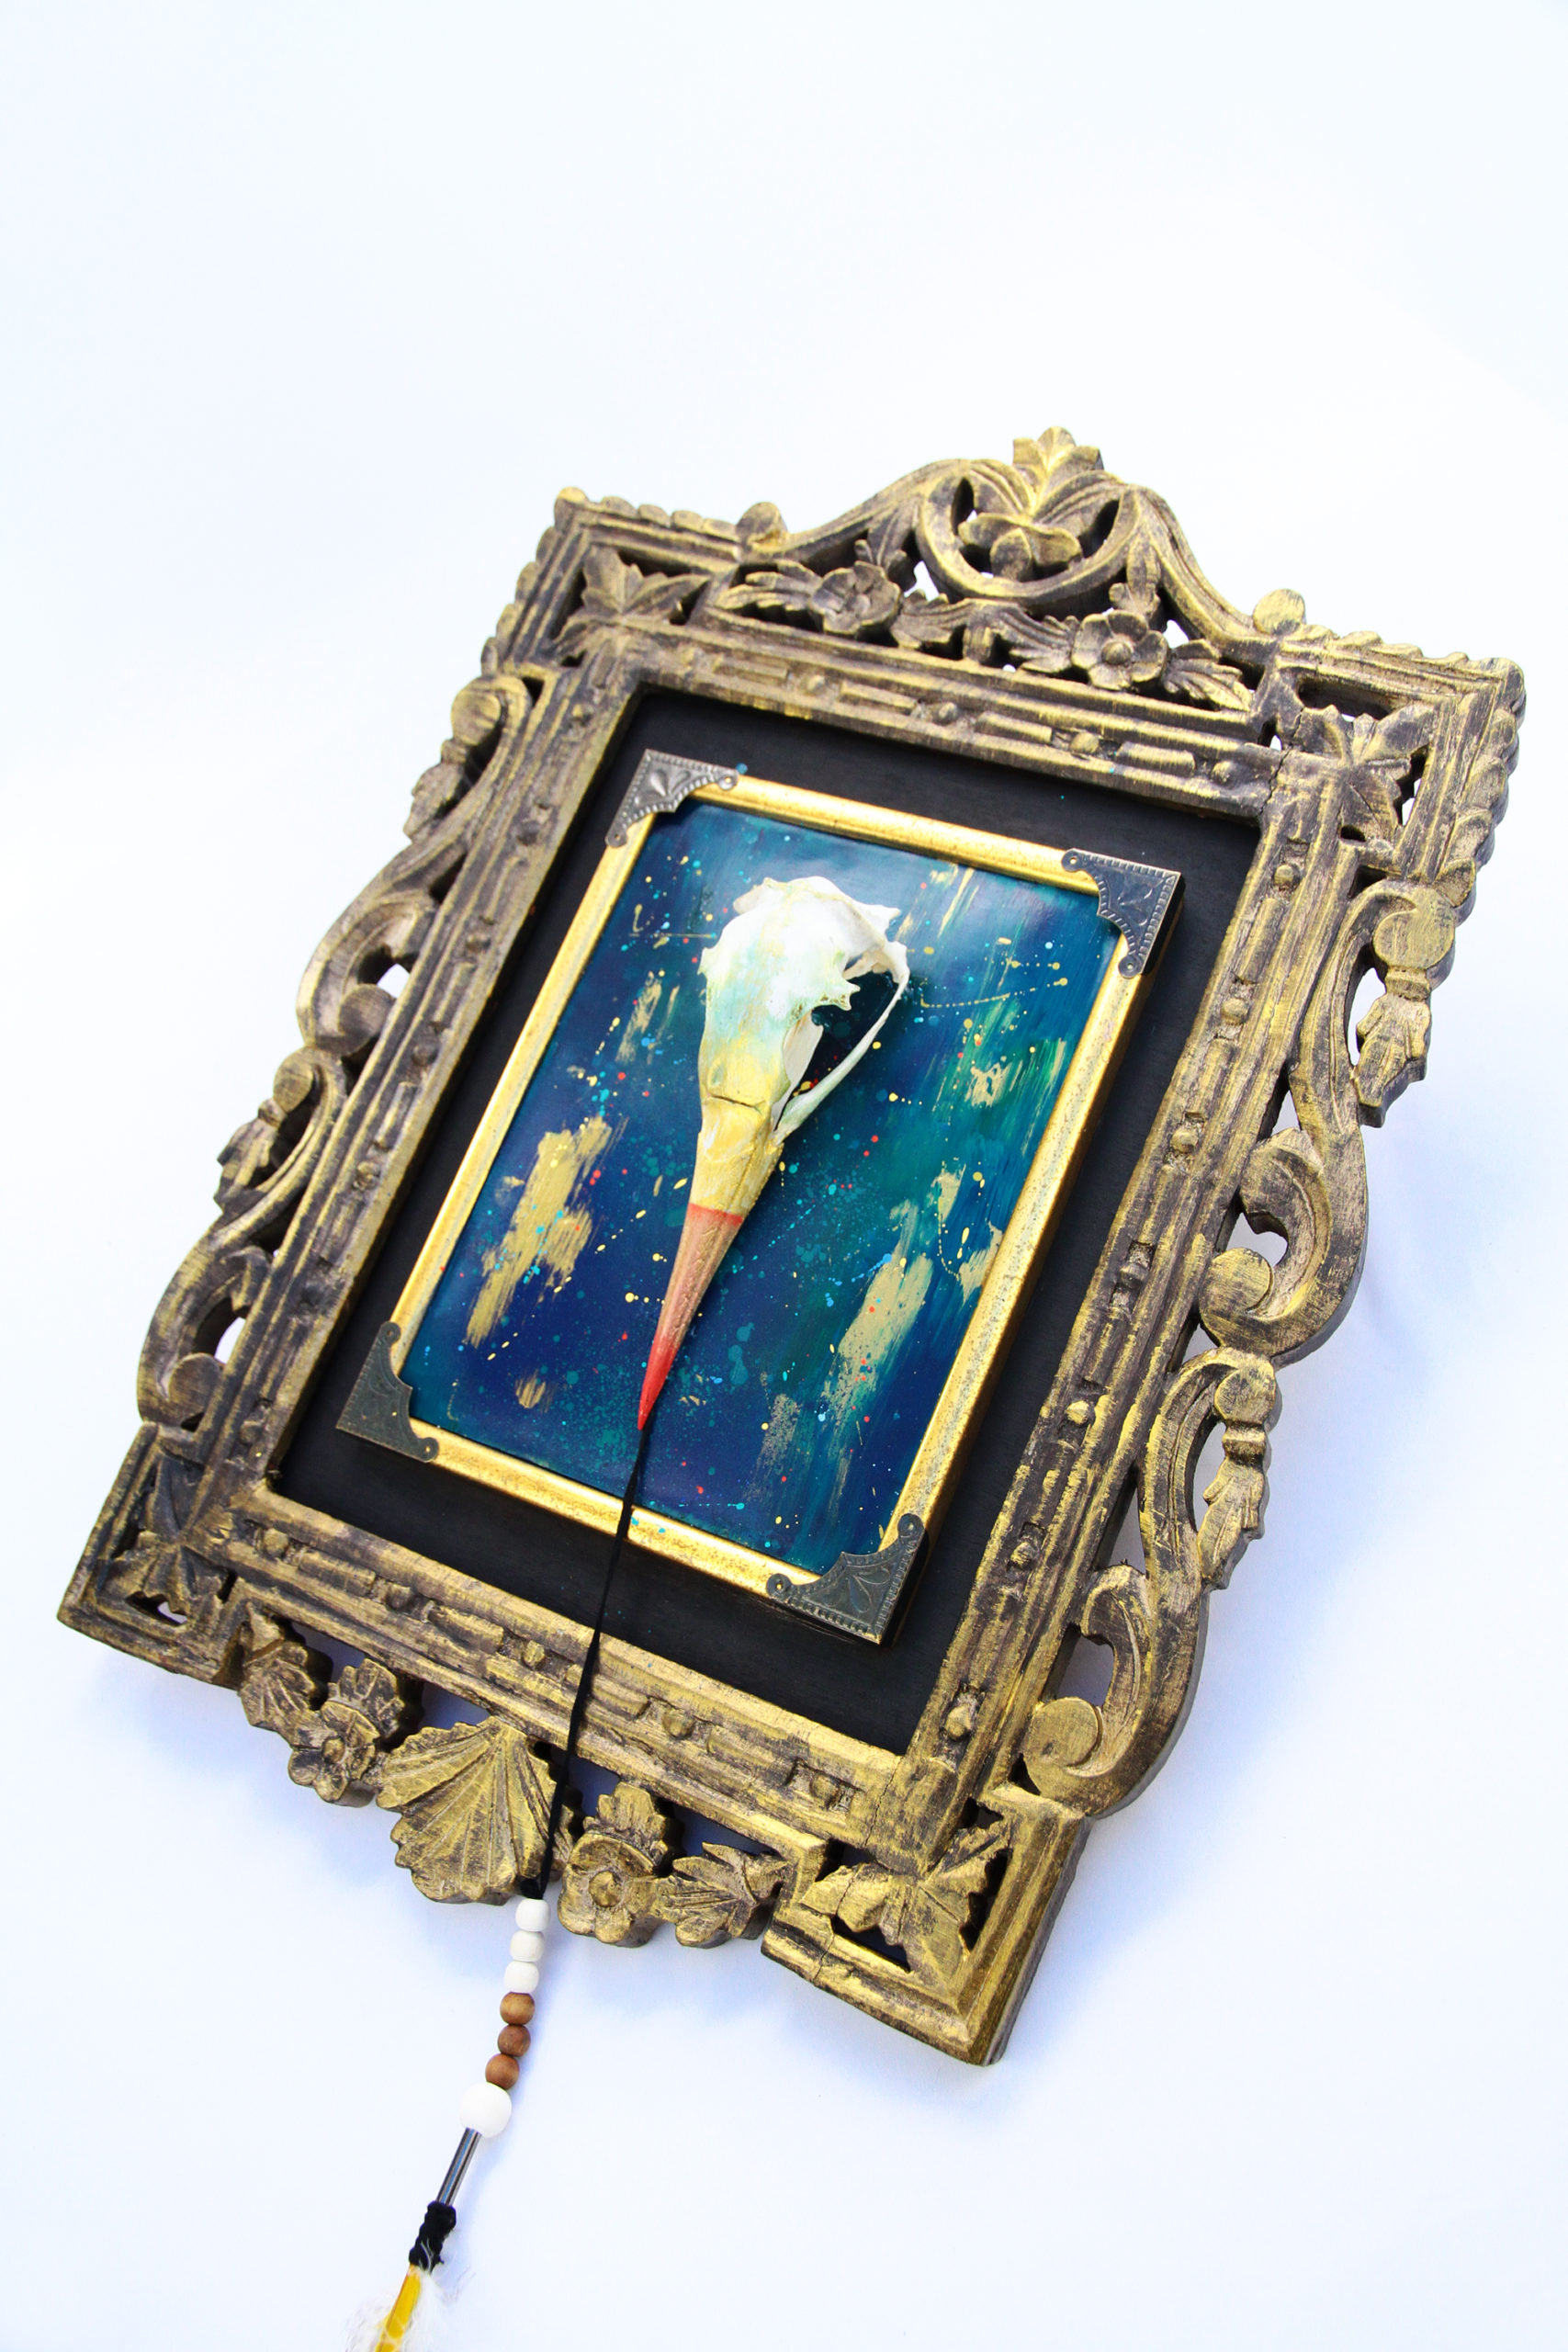 Miss Vitriol - Custom sur Crâne d'Oiseau